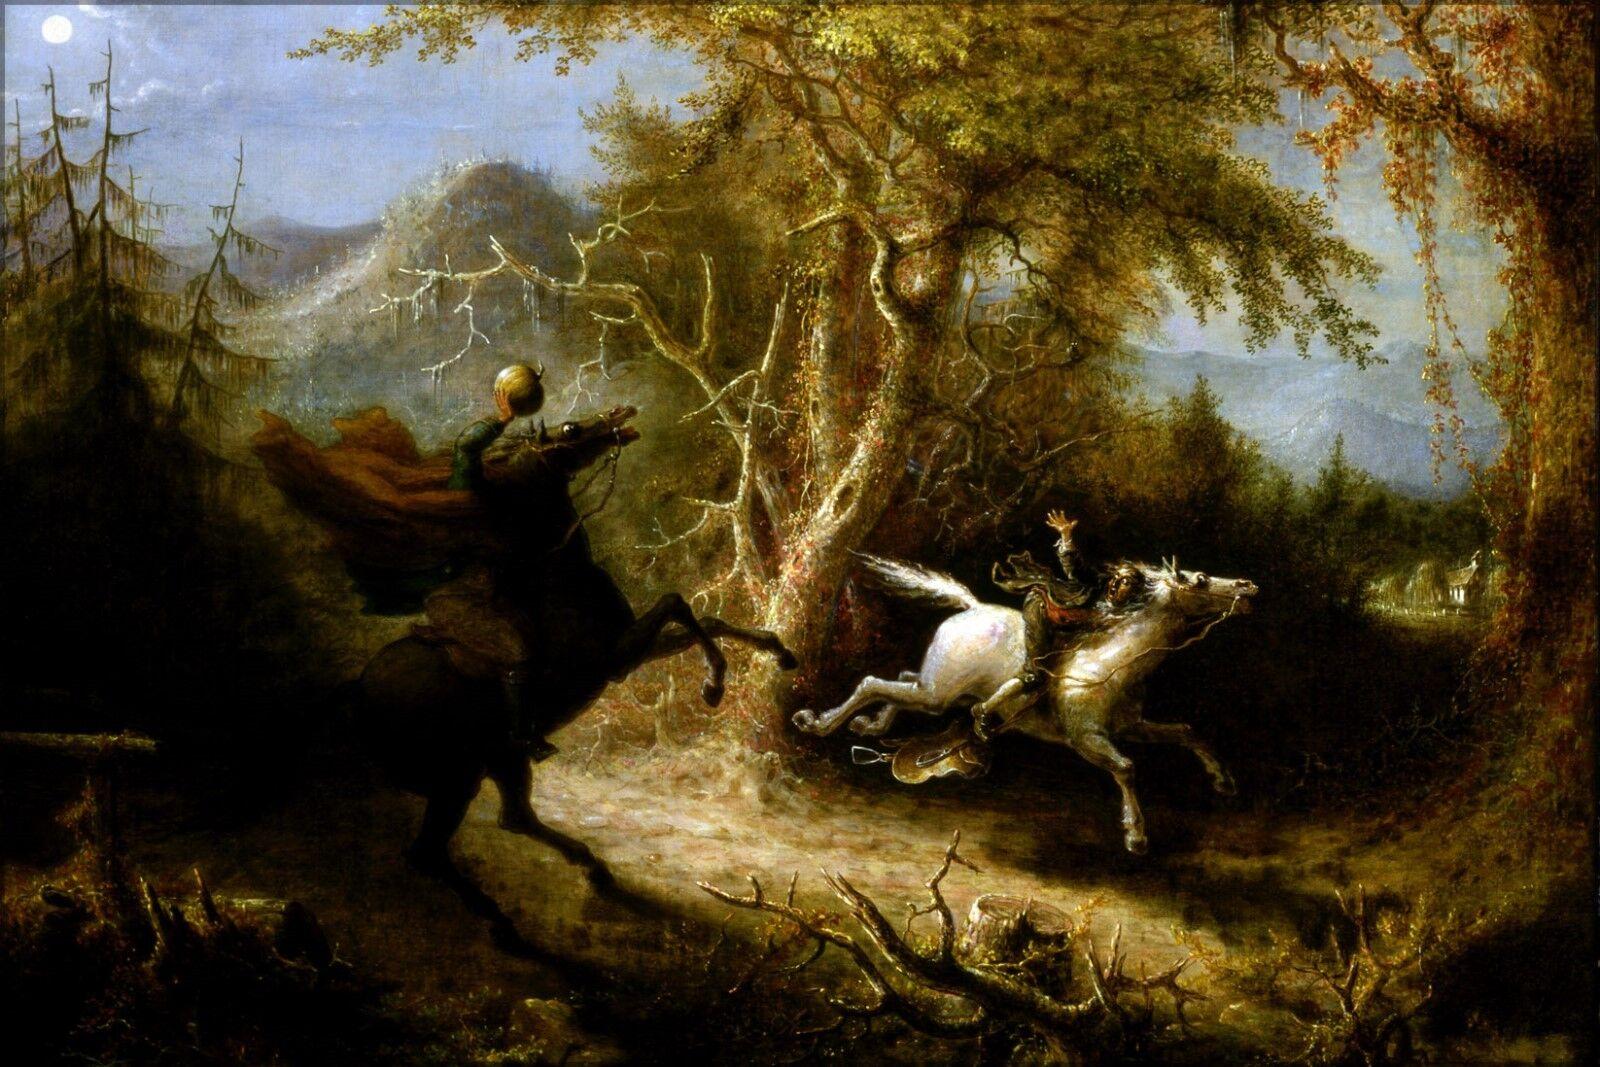 Poster, Many Größes; Headless Horseman Pursuing Ichabod Crane By John Quidor 1858